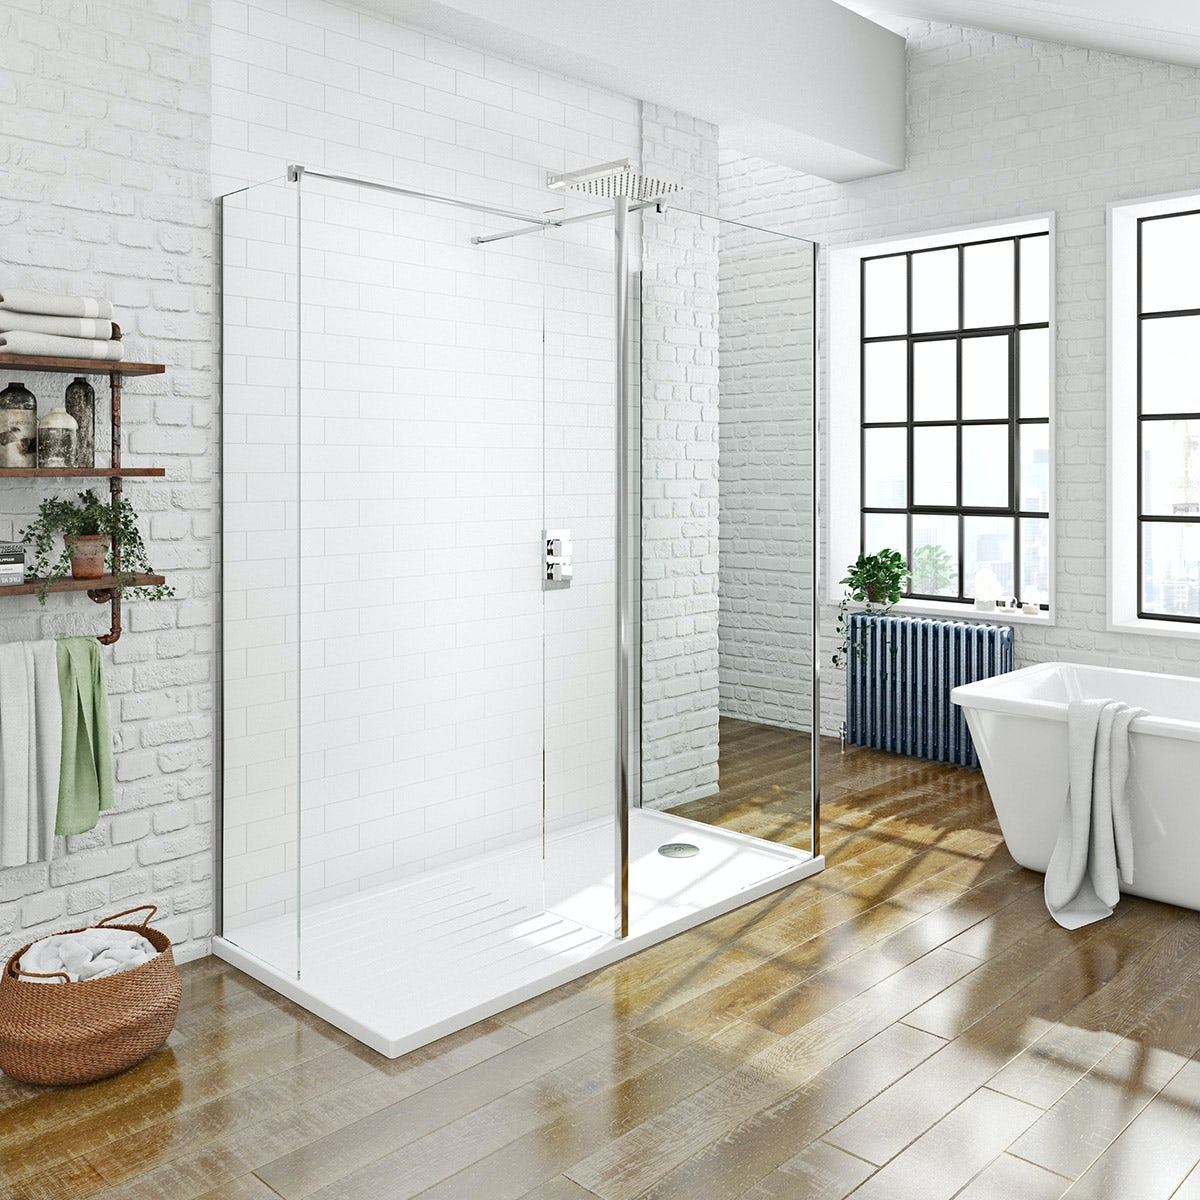 Walk In Shower Enclosure Mode Spacious Luxury 8mm 3 Sided Walk In Shower Enclosure With